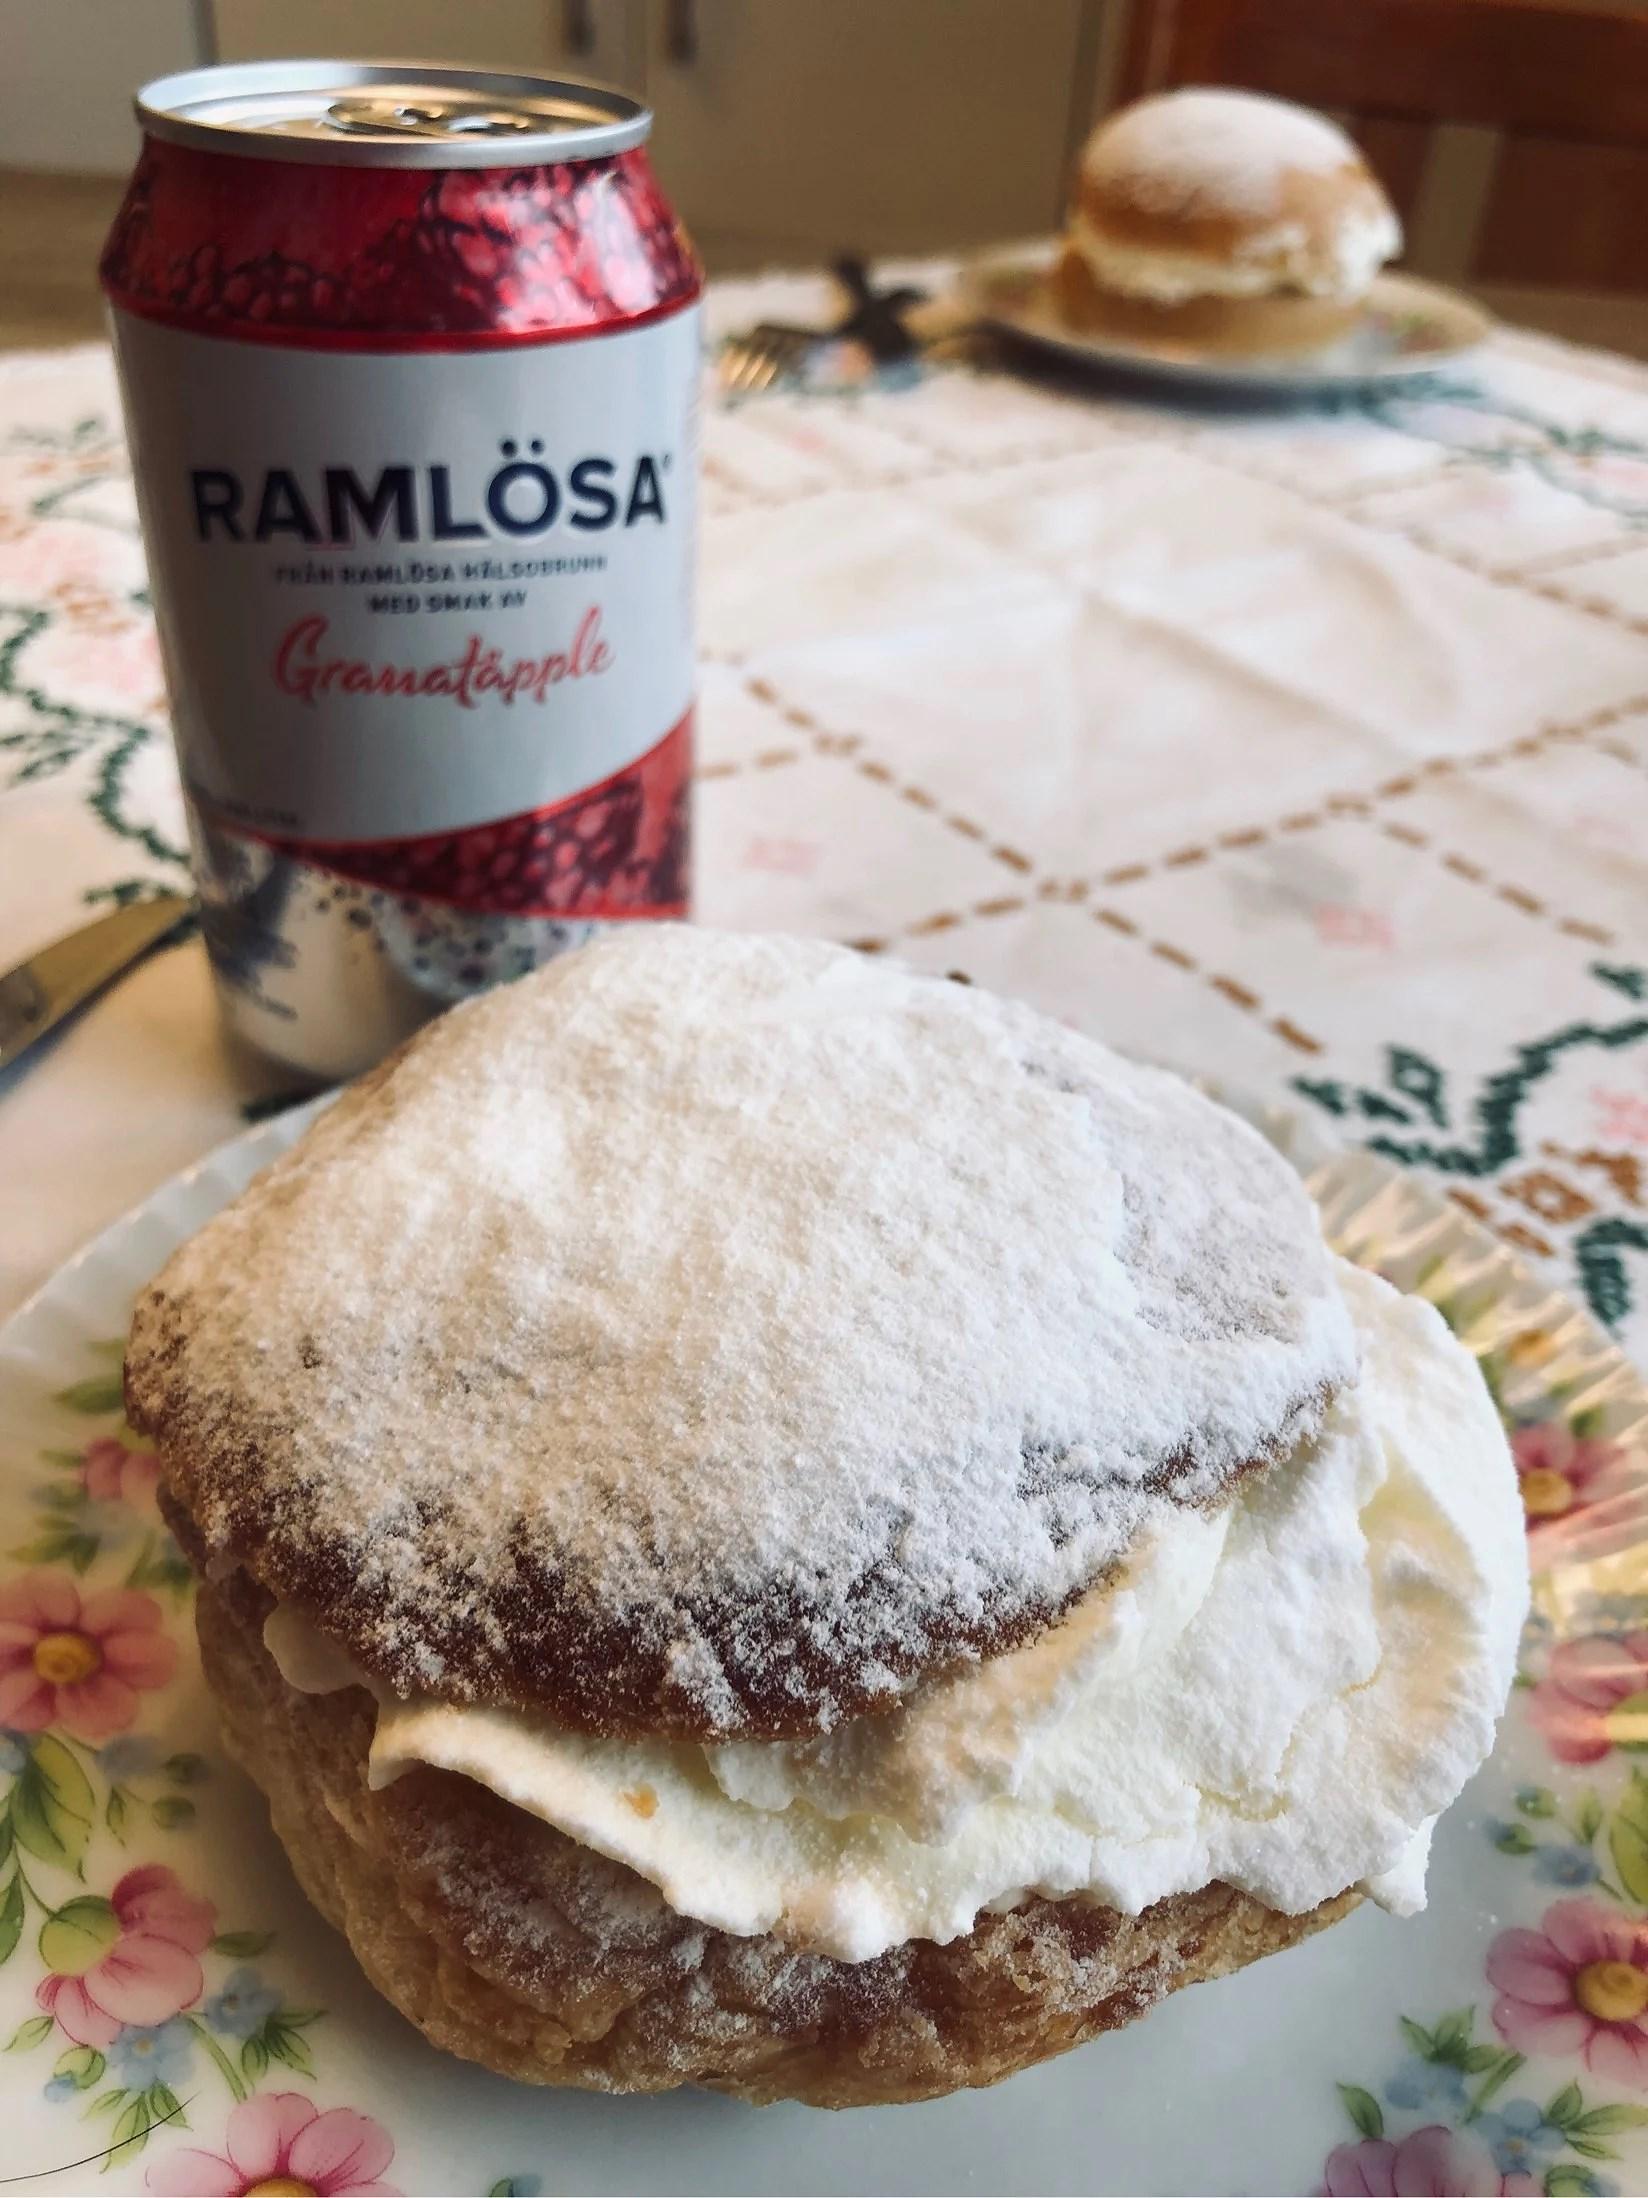 SEMLEFIKA HOS FARMOR